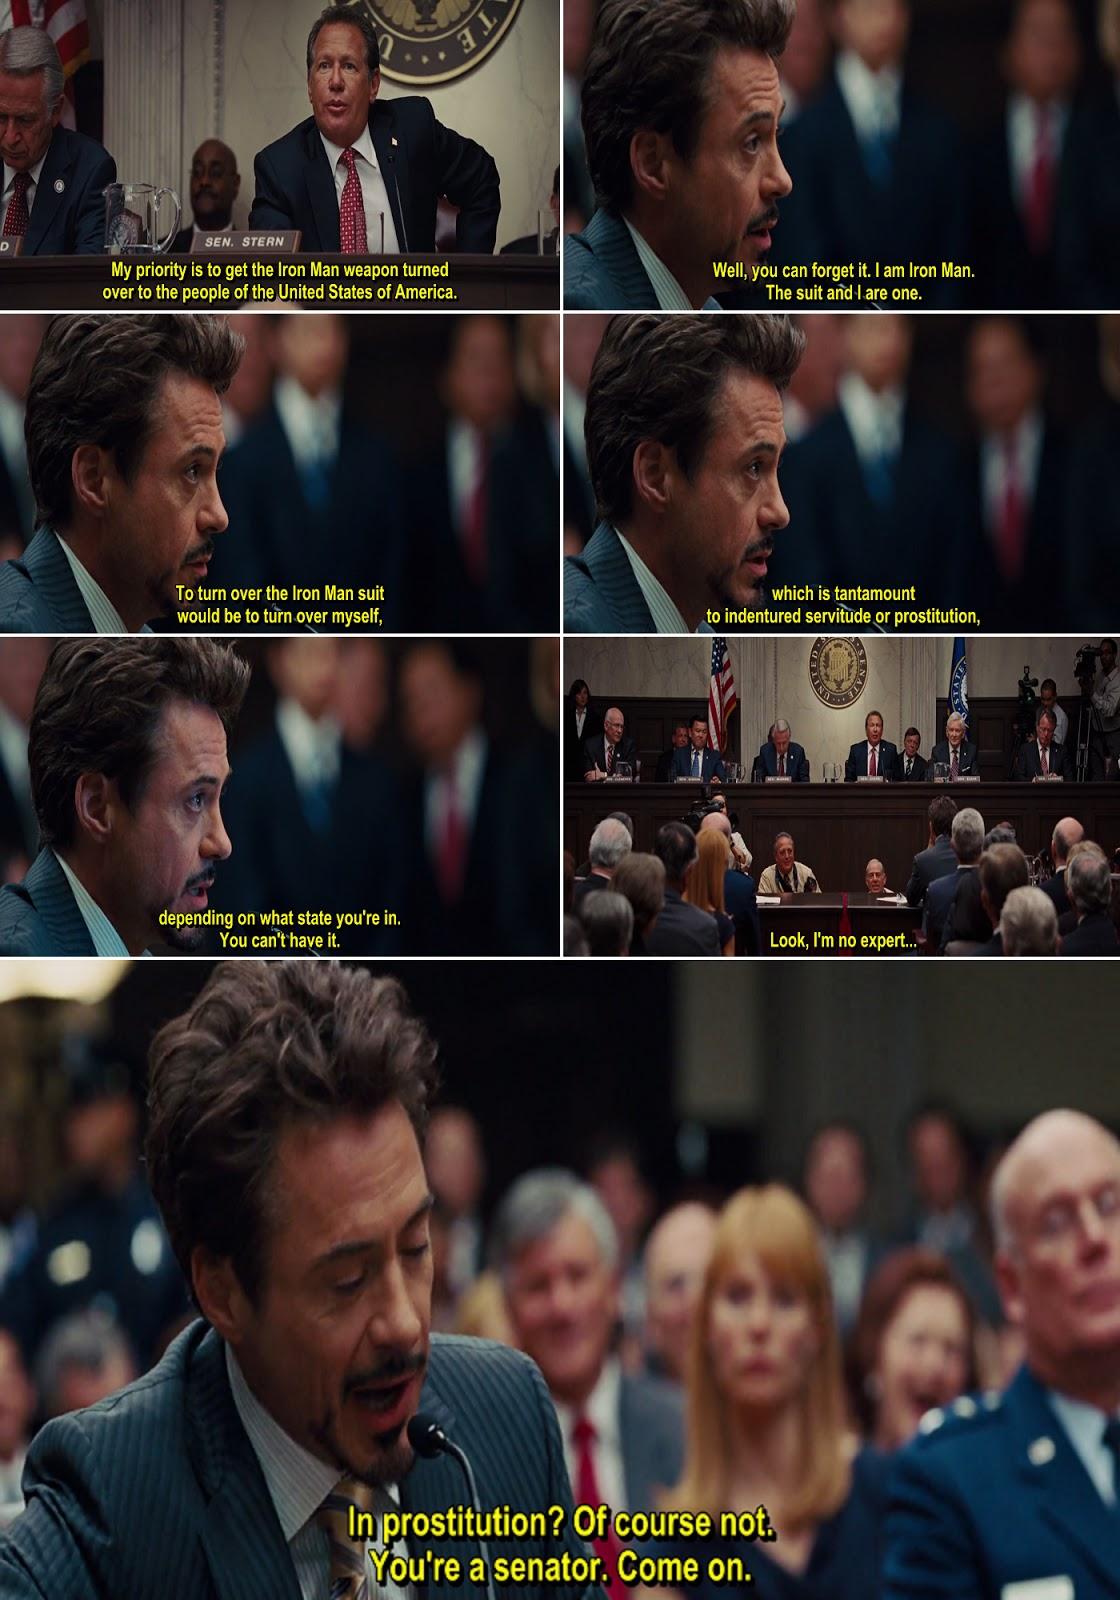 funny movie quotes ever 8 funny movie quotes ever 9